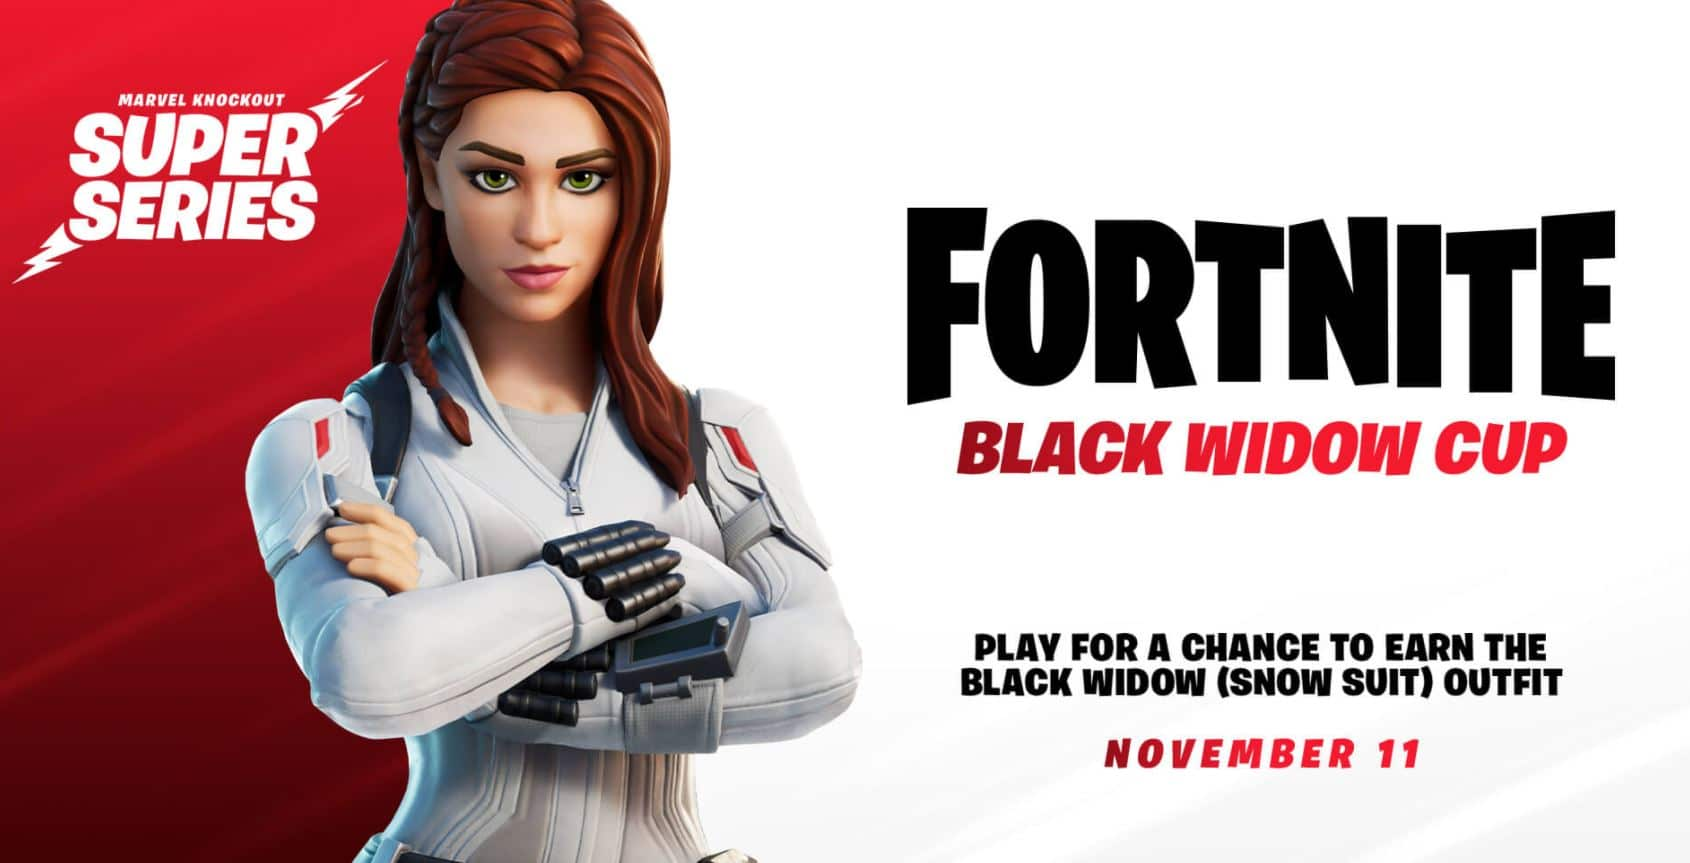 Copa Marvel Viuda Negra Fortnite